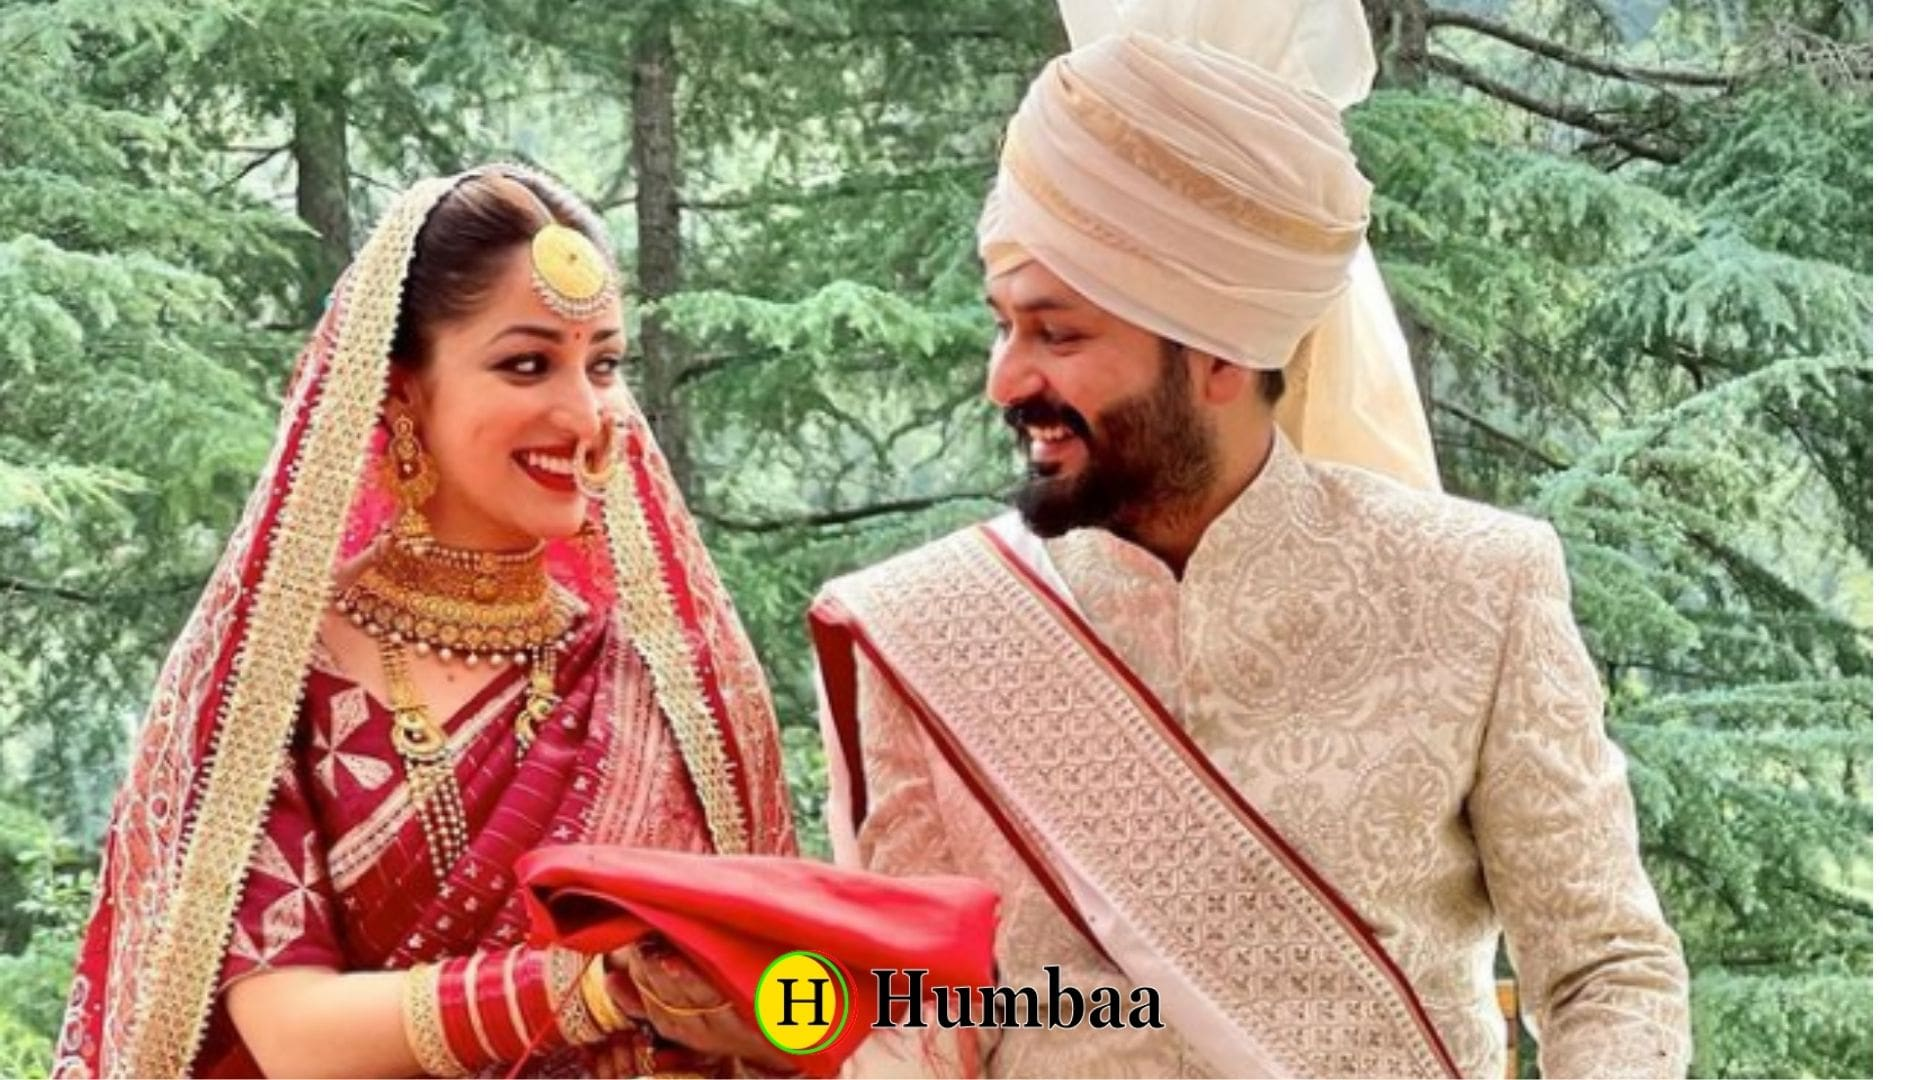 yami-gautam-wedding-newly-wed-yami-gautams-bridal-charm-is-all-thanks-to-her-elegant-saree